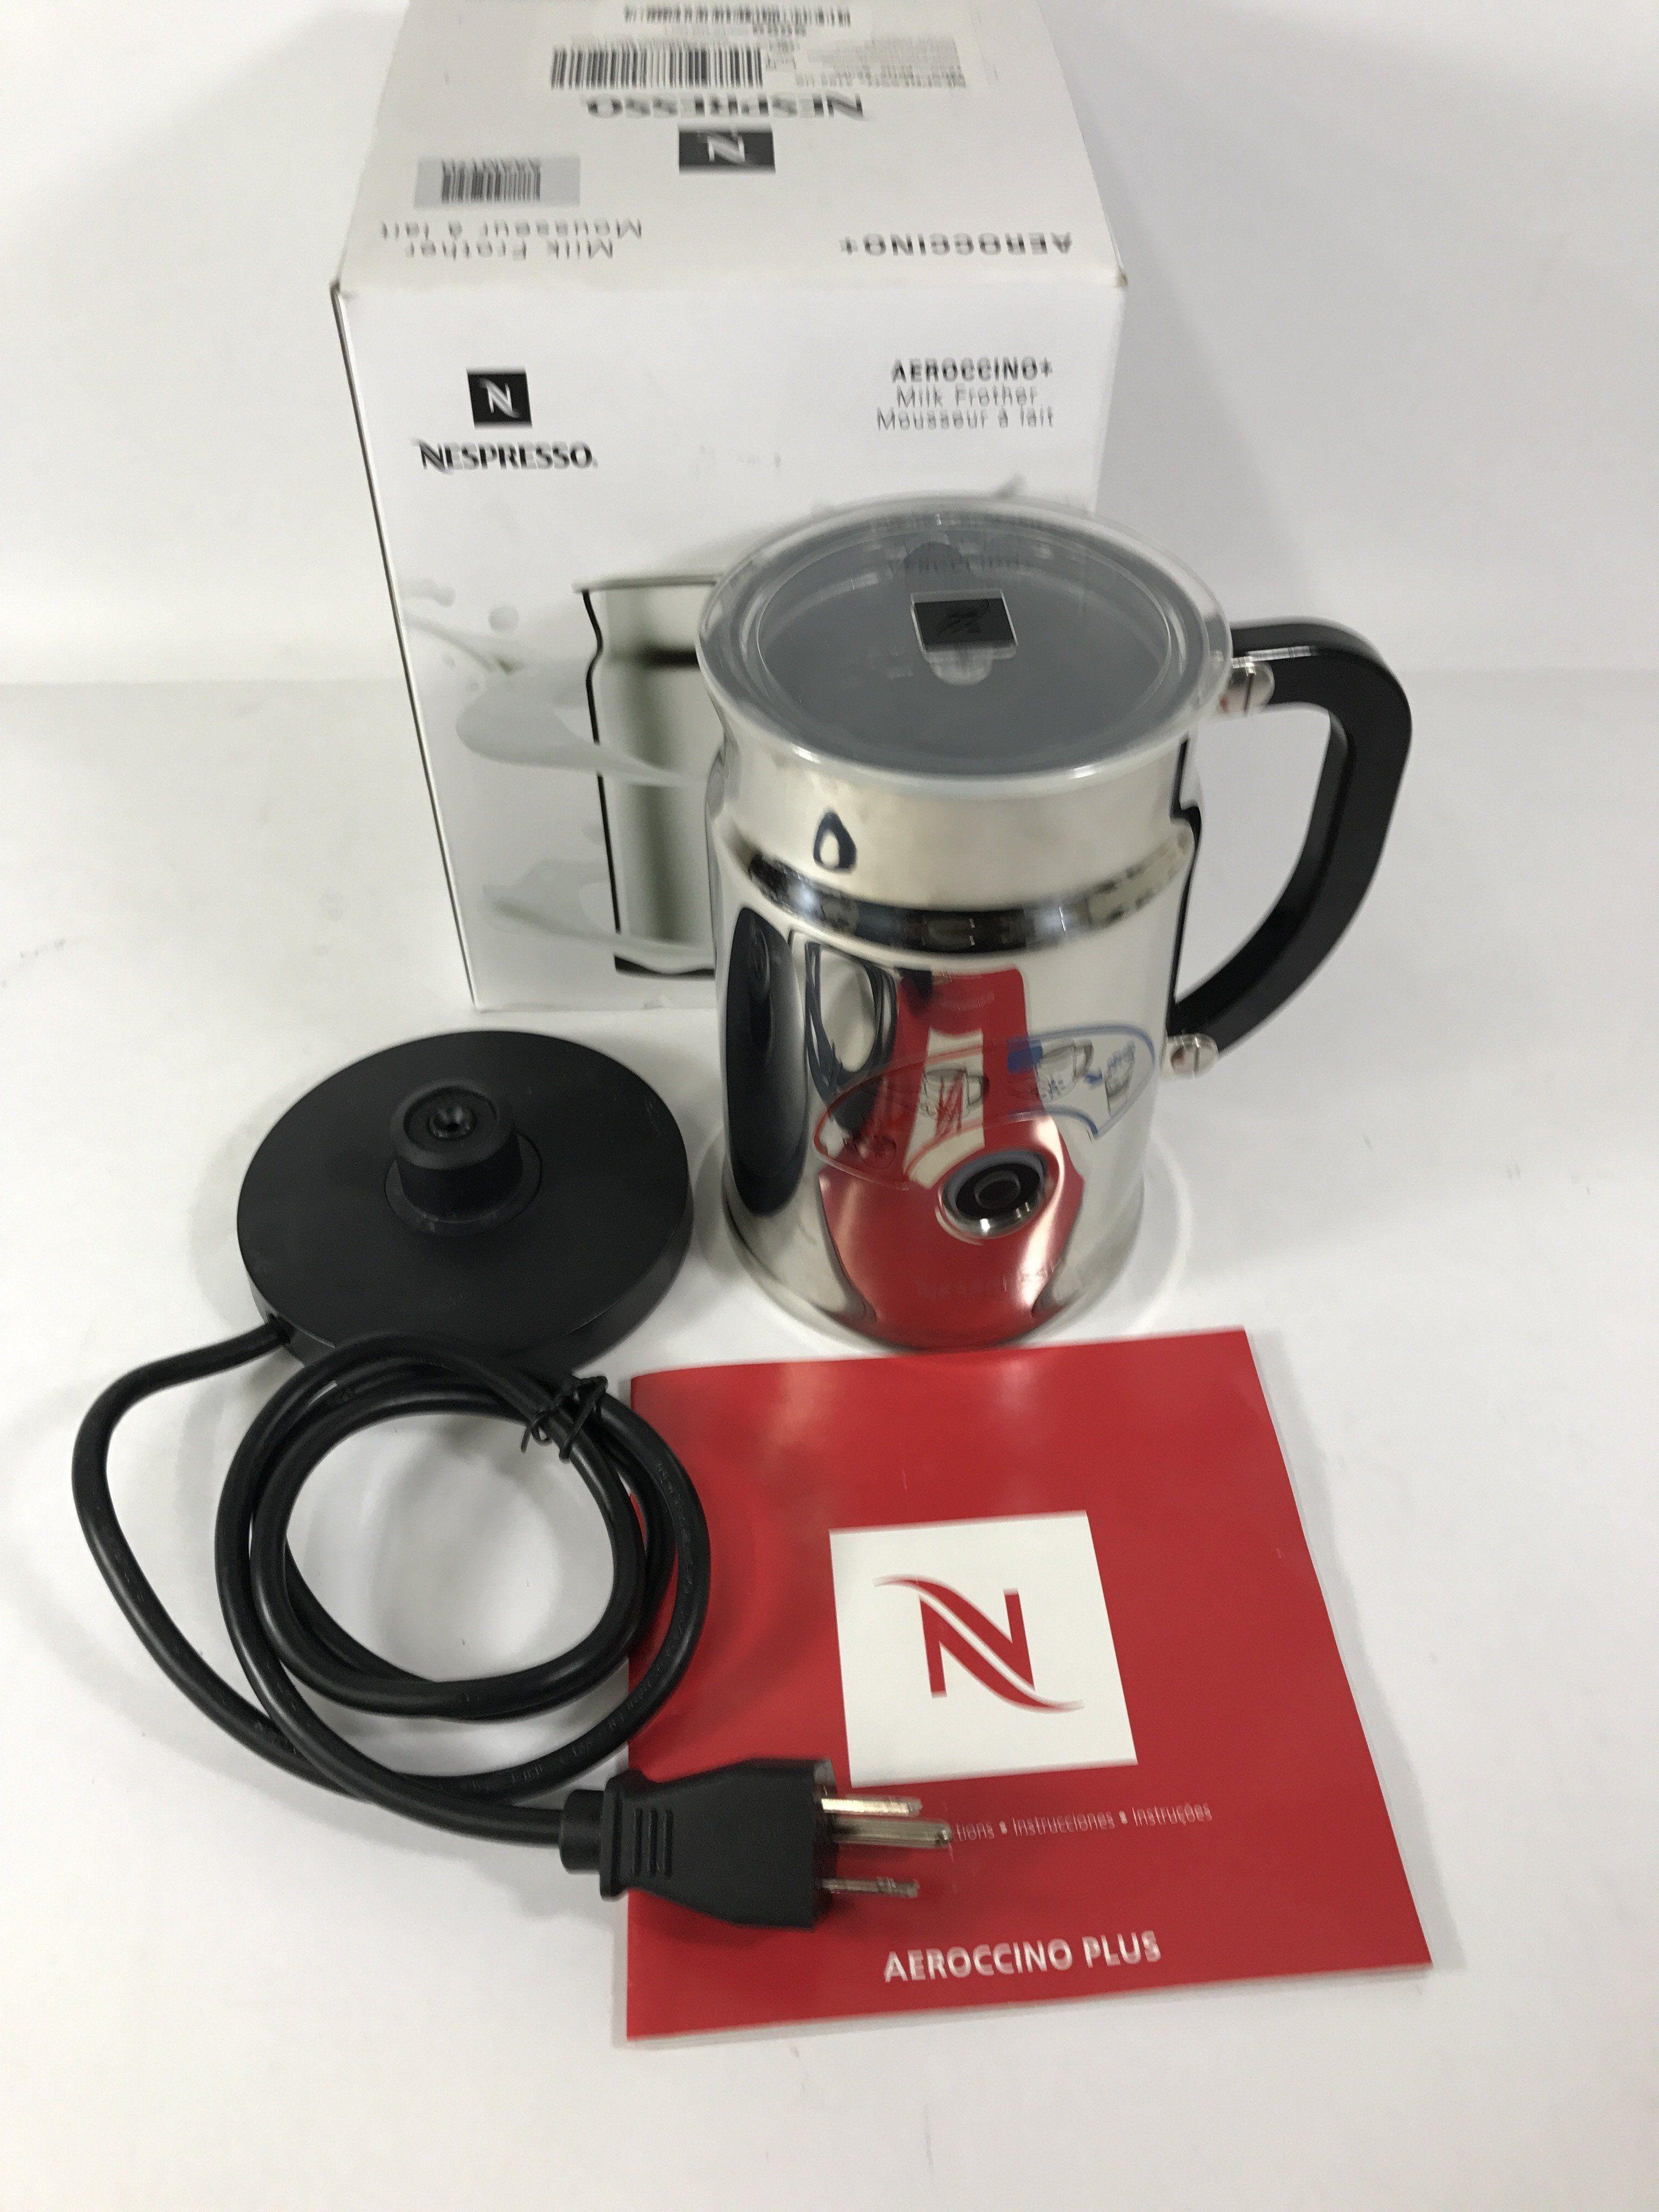 Nespresso Aeroccino Plus Milk Frother Milk frother